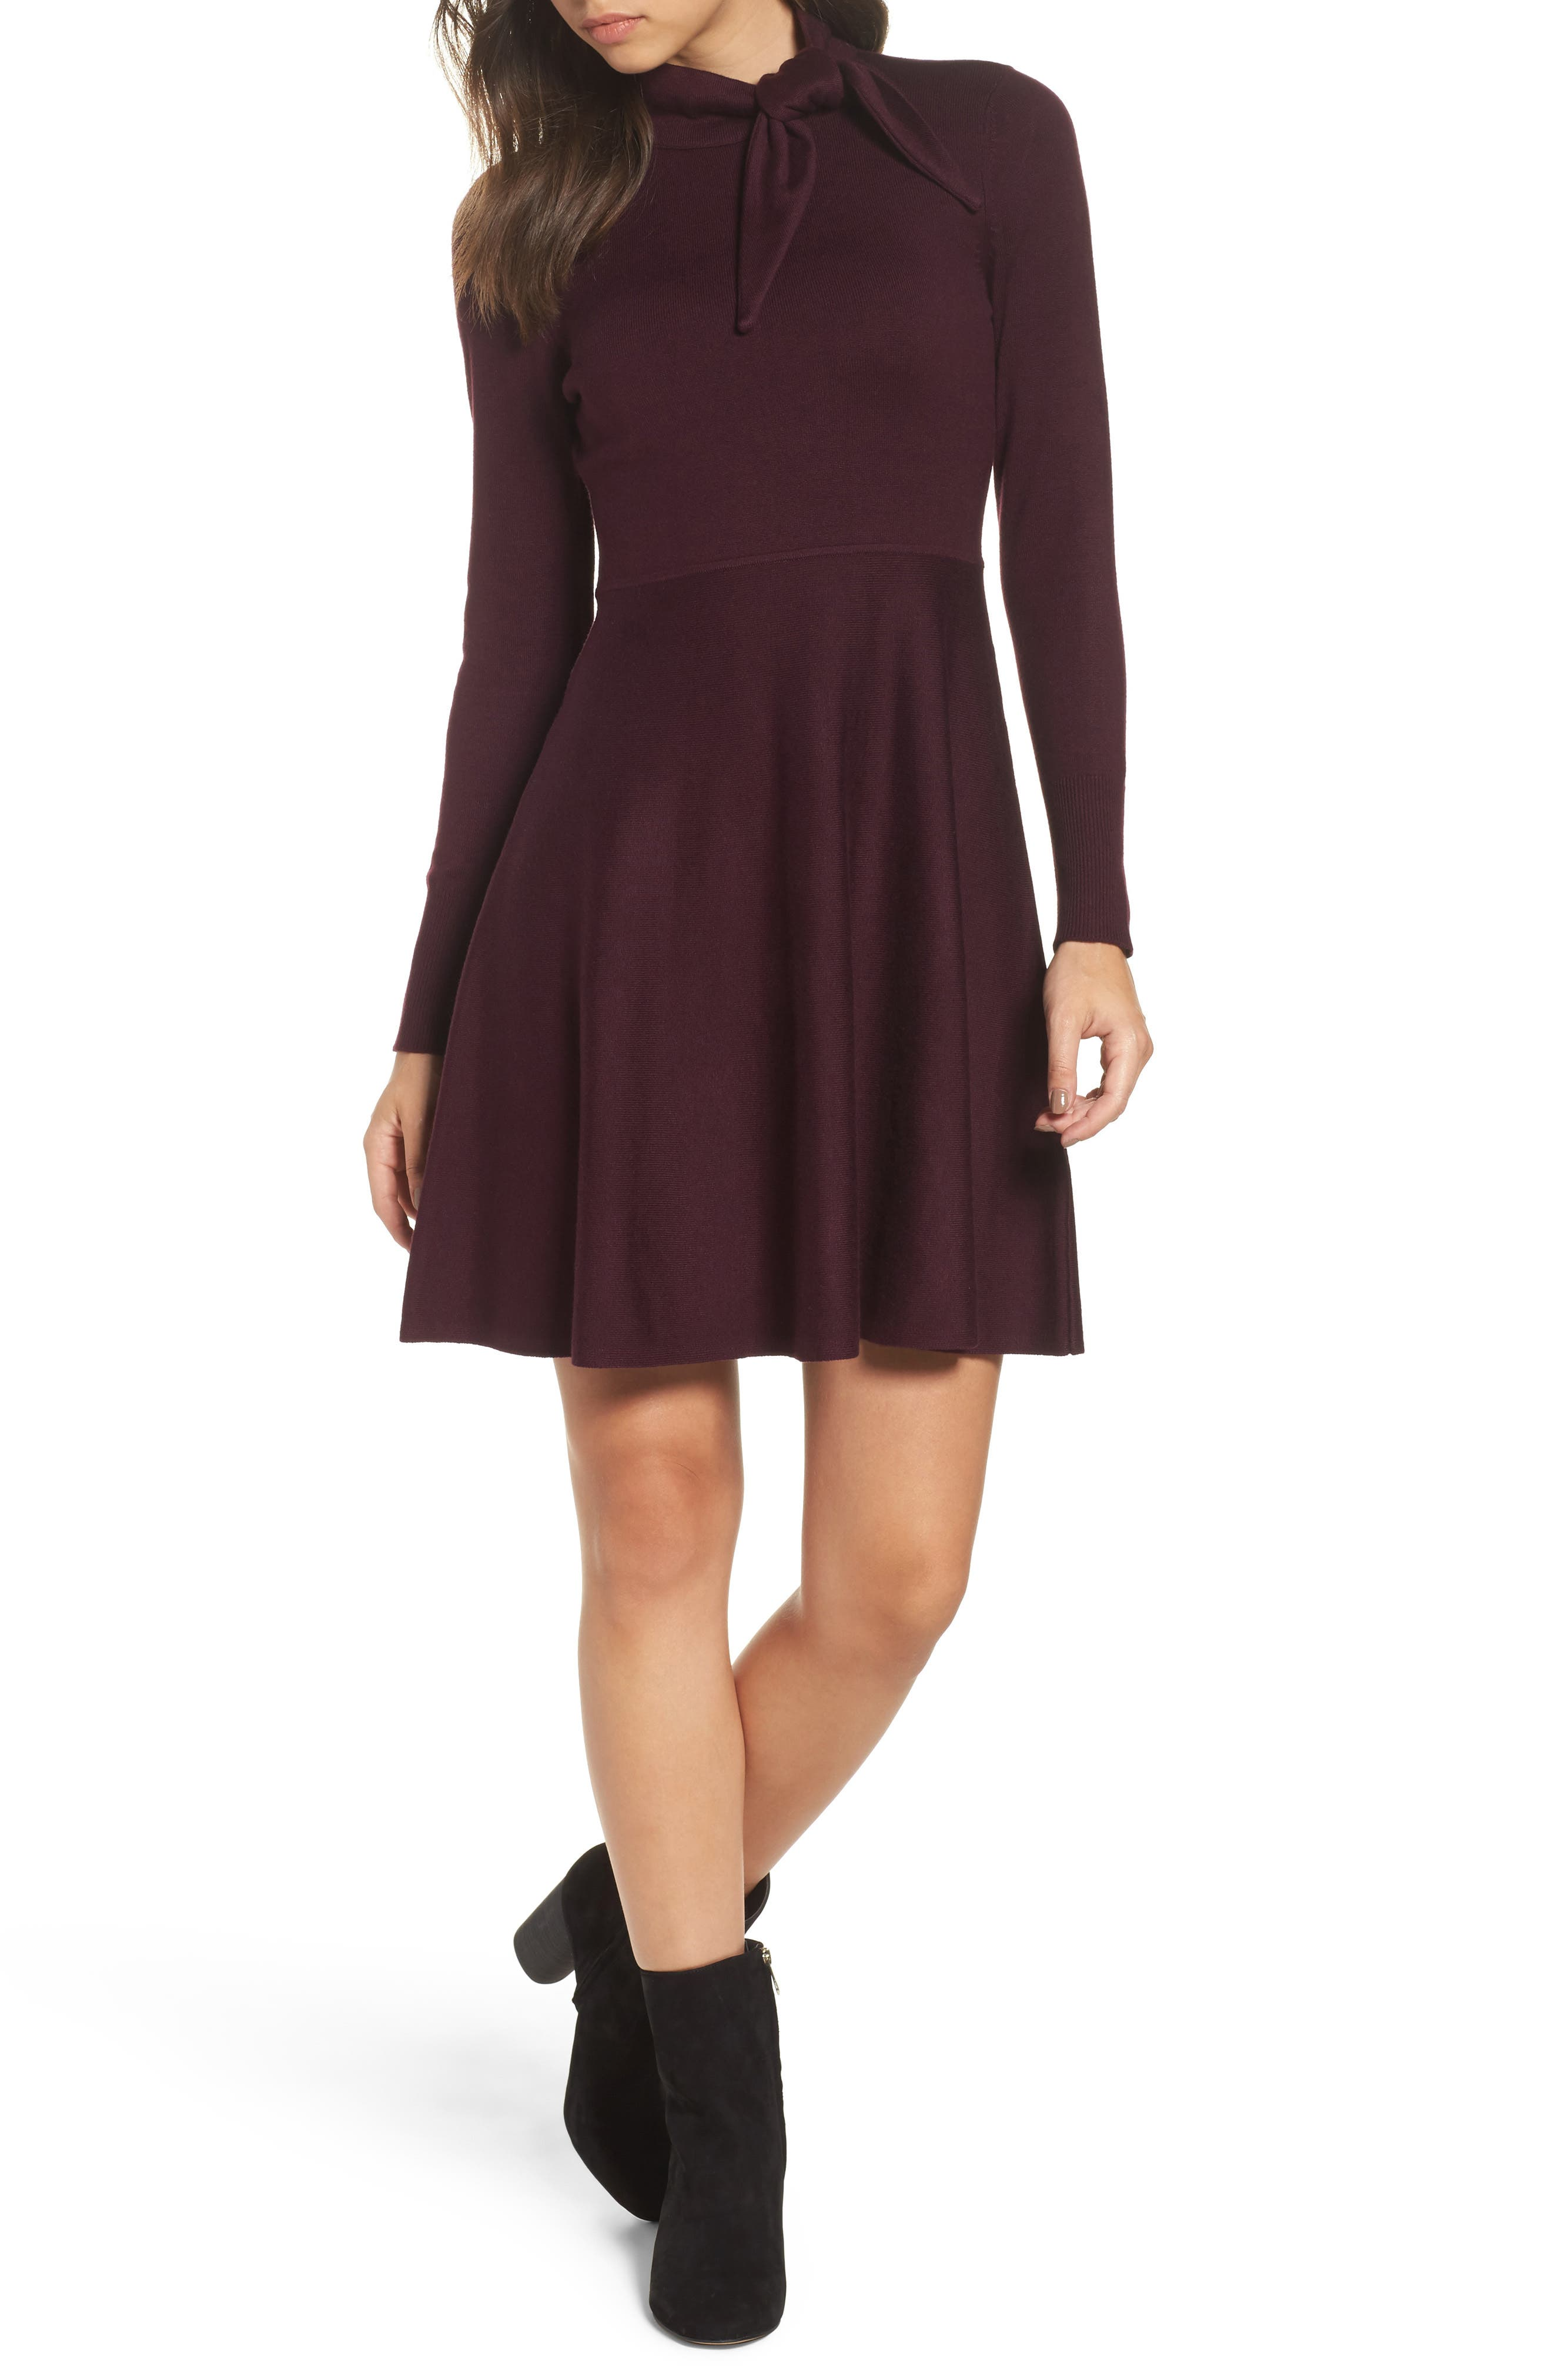 Main Image - Eliza J Tie Neck Fit & Flare Dress (Regular & Petite)